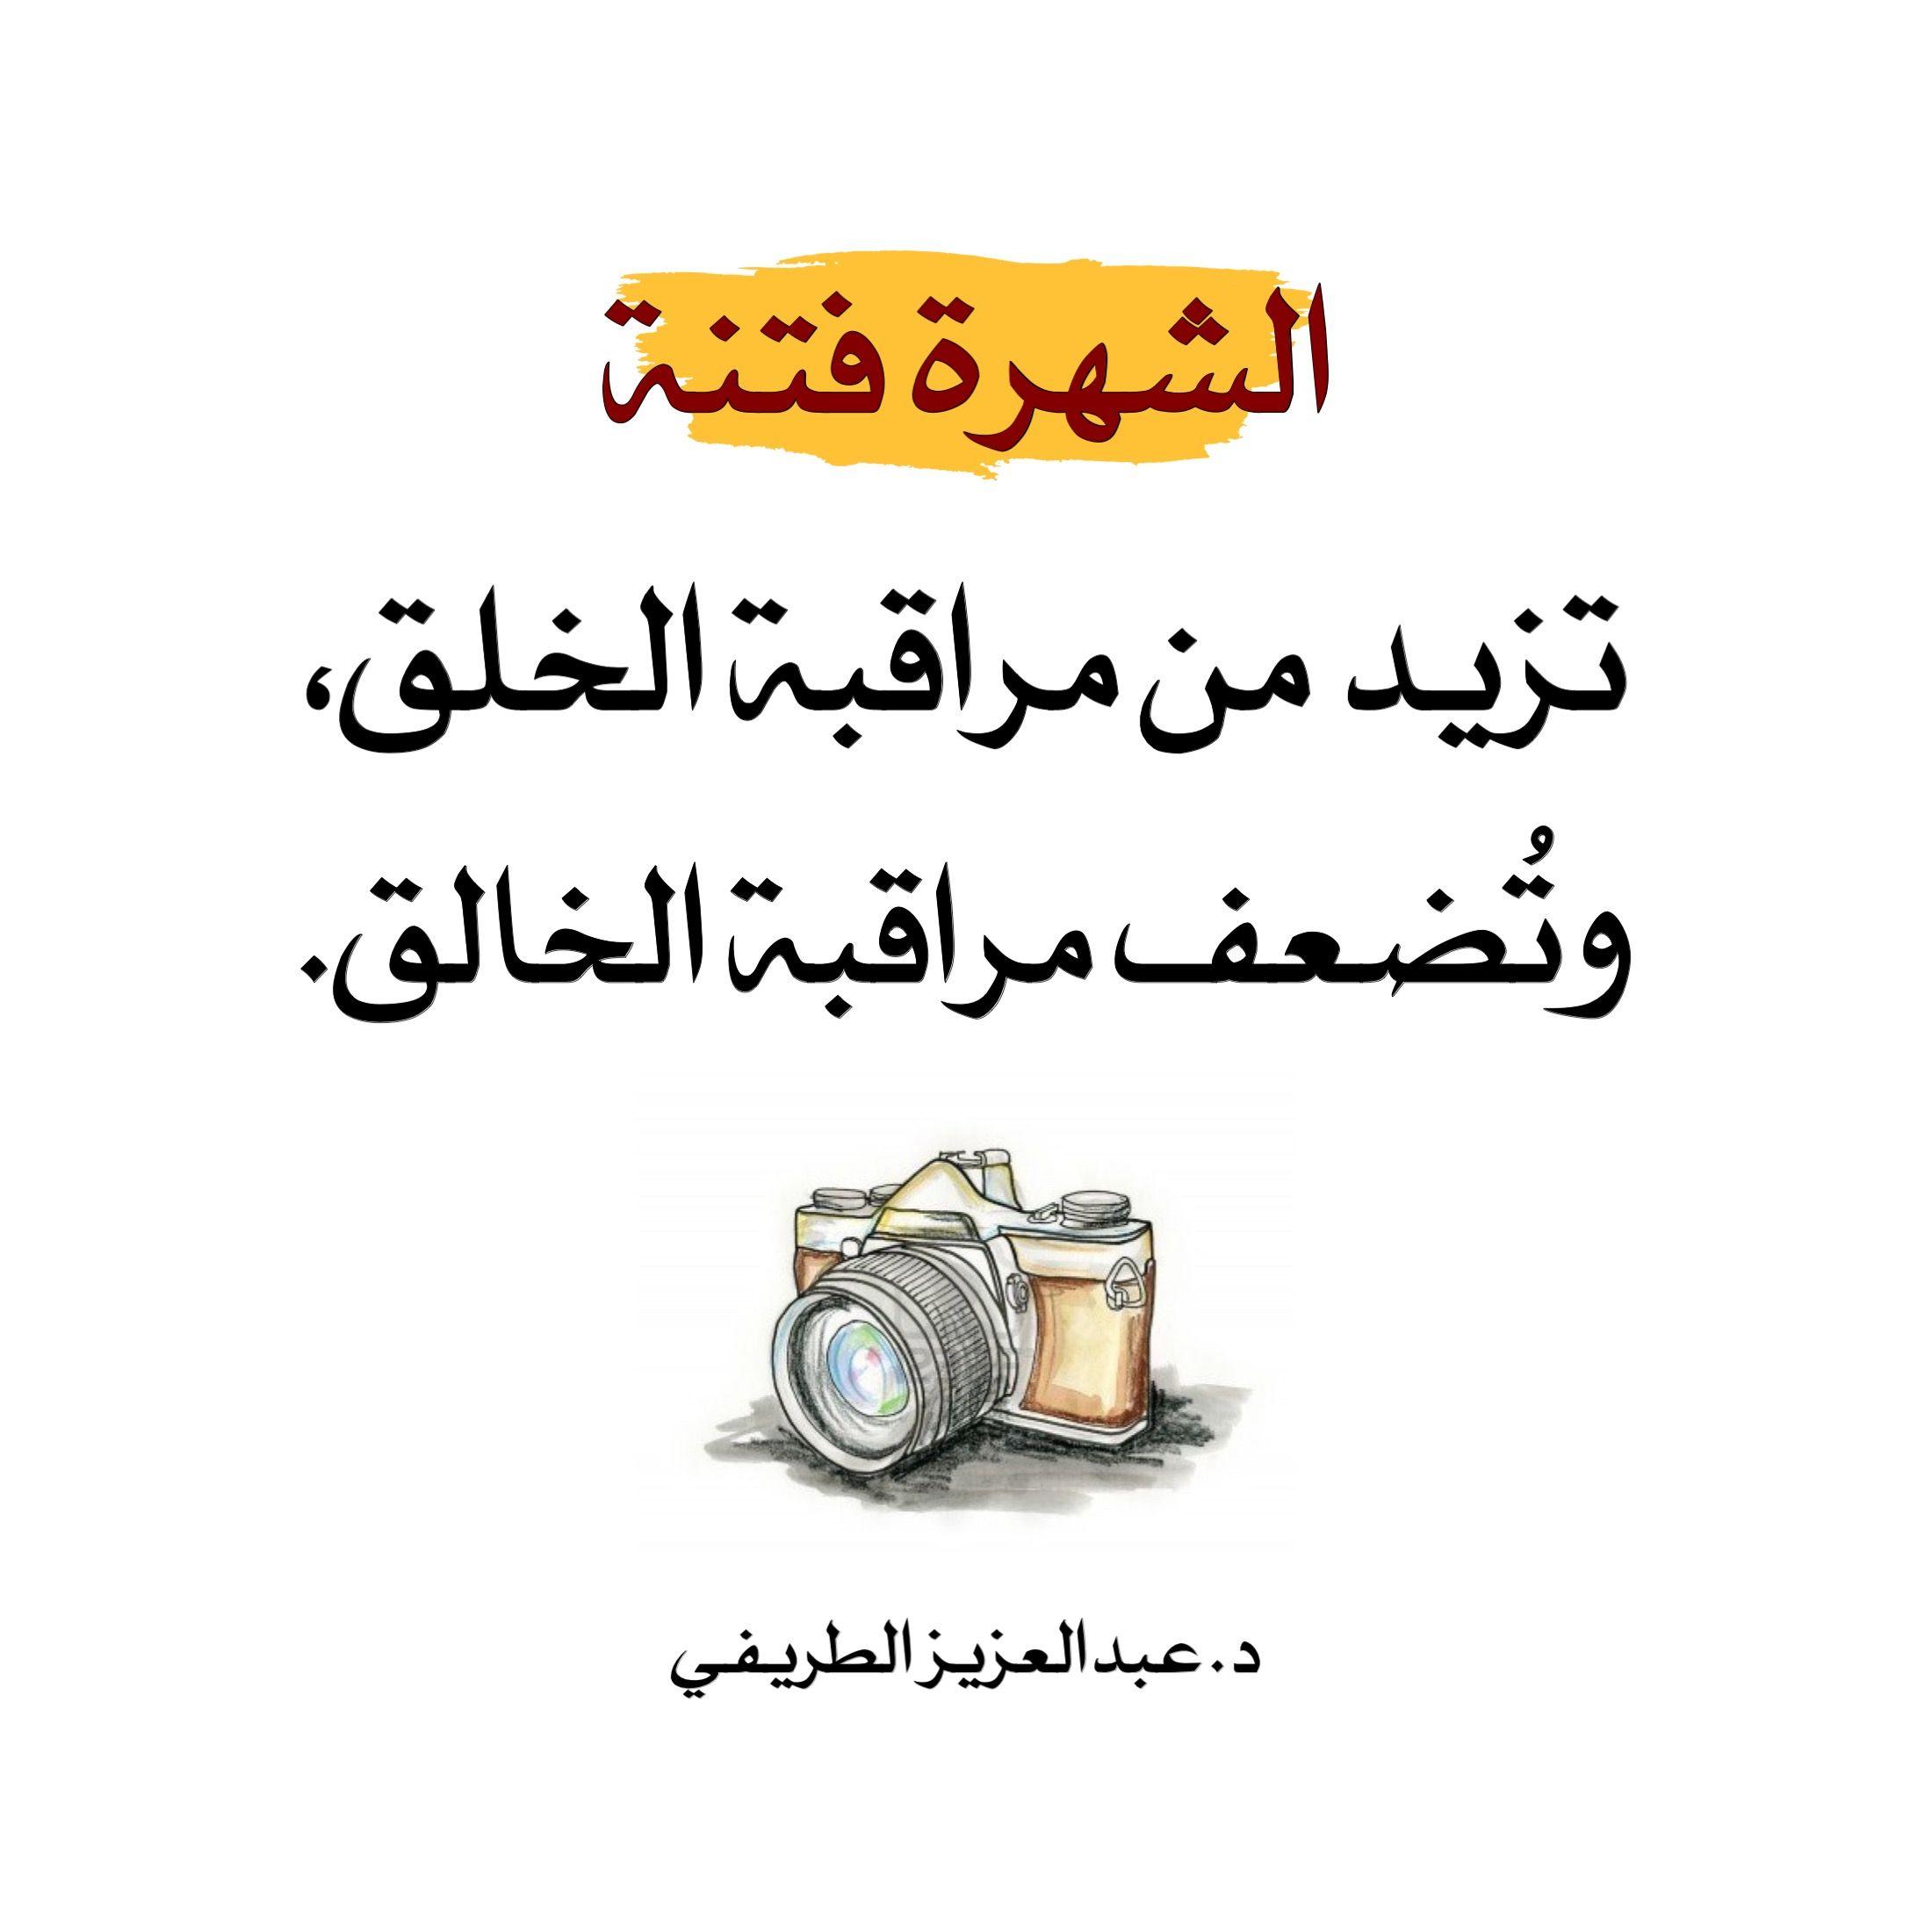 Pin By الأثر الجميل On أقوال الصحابة والعلماء Words Islamic Quotes Ahadeeth